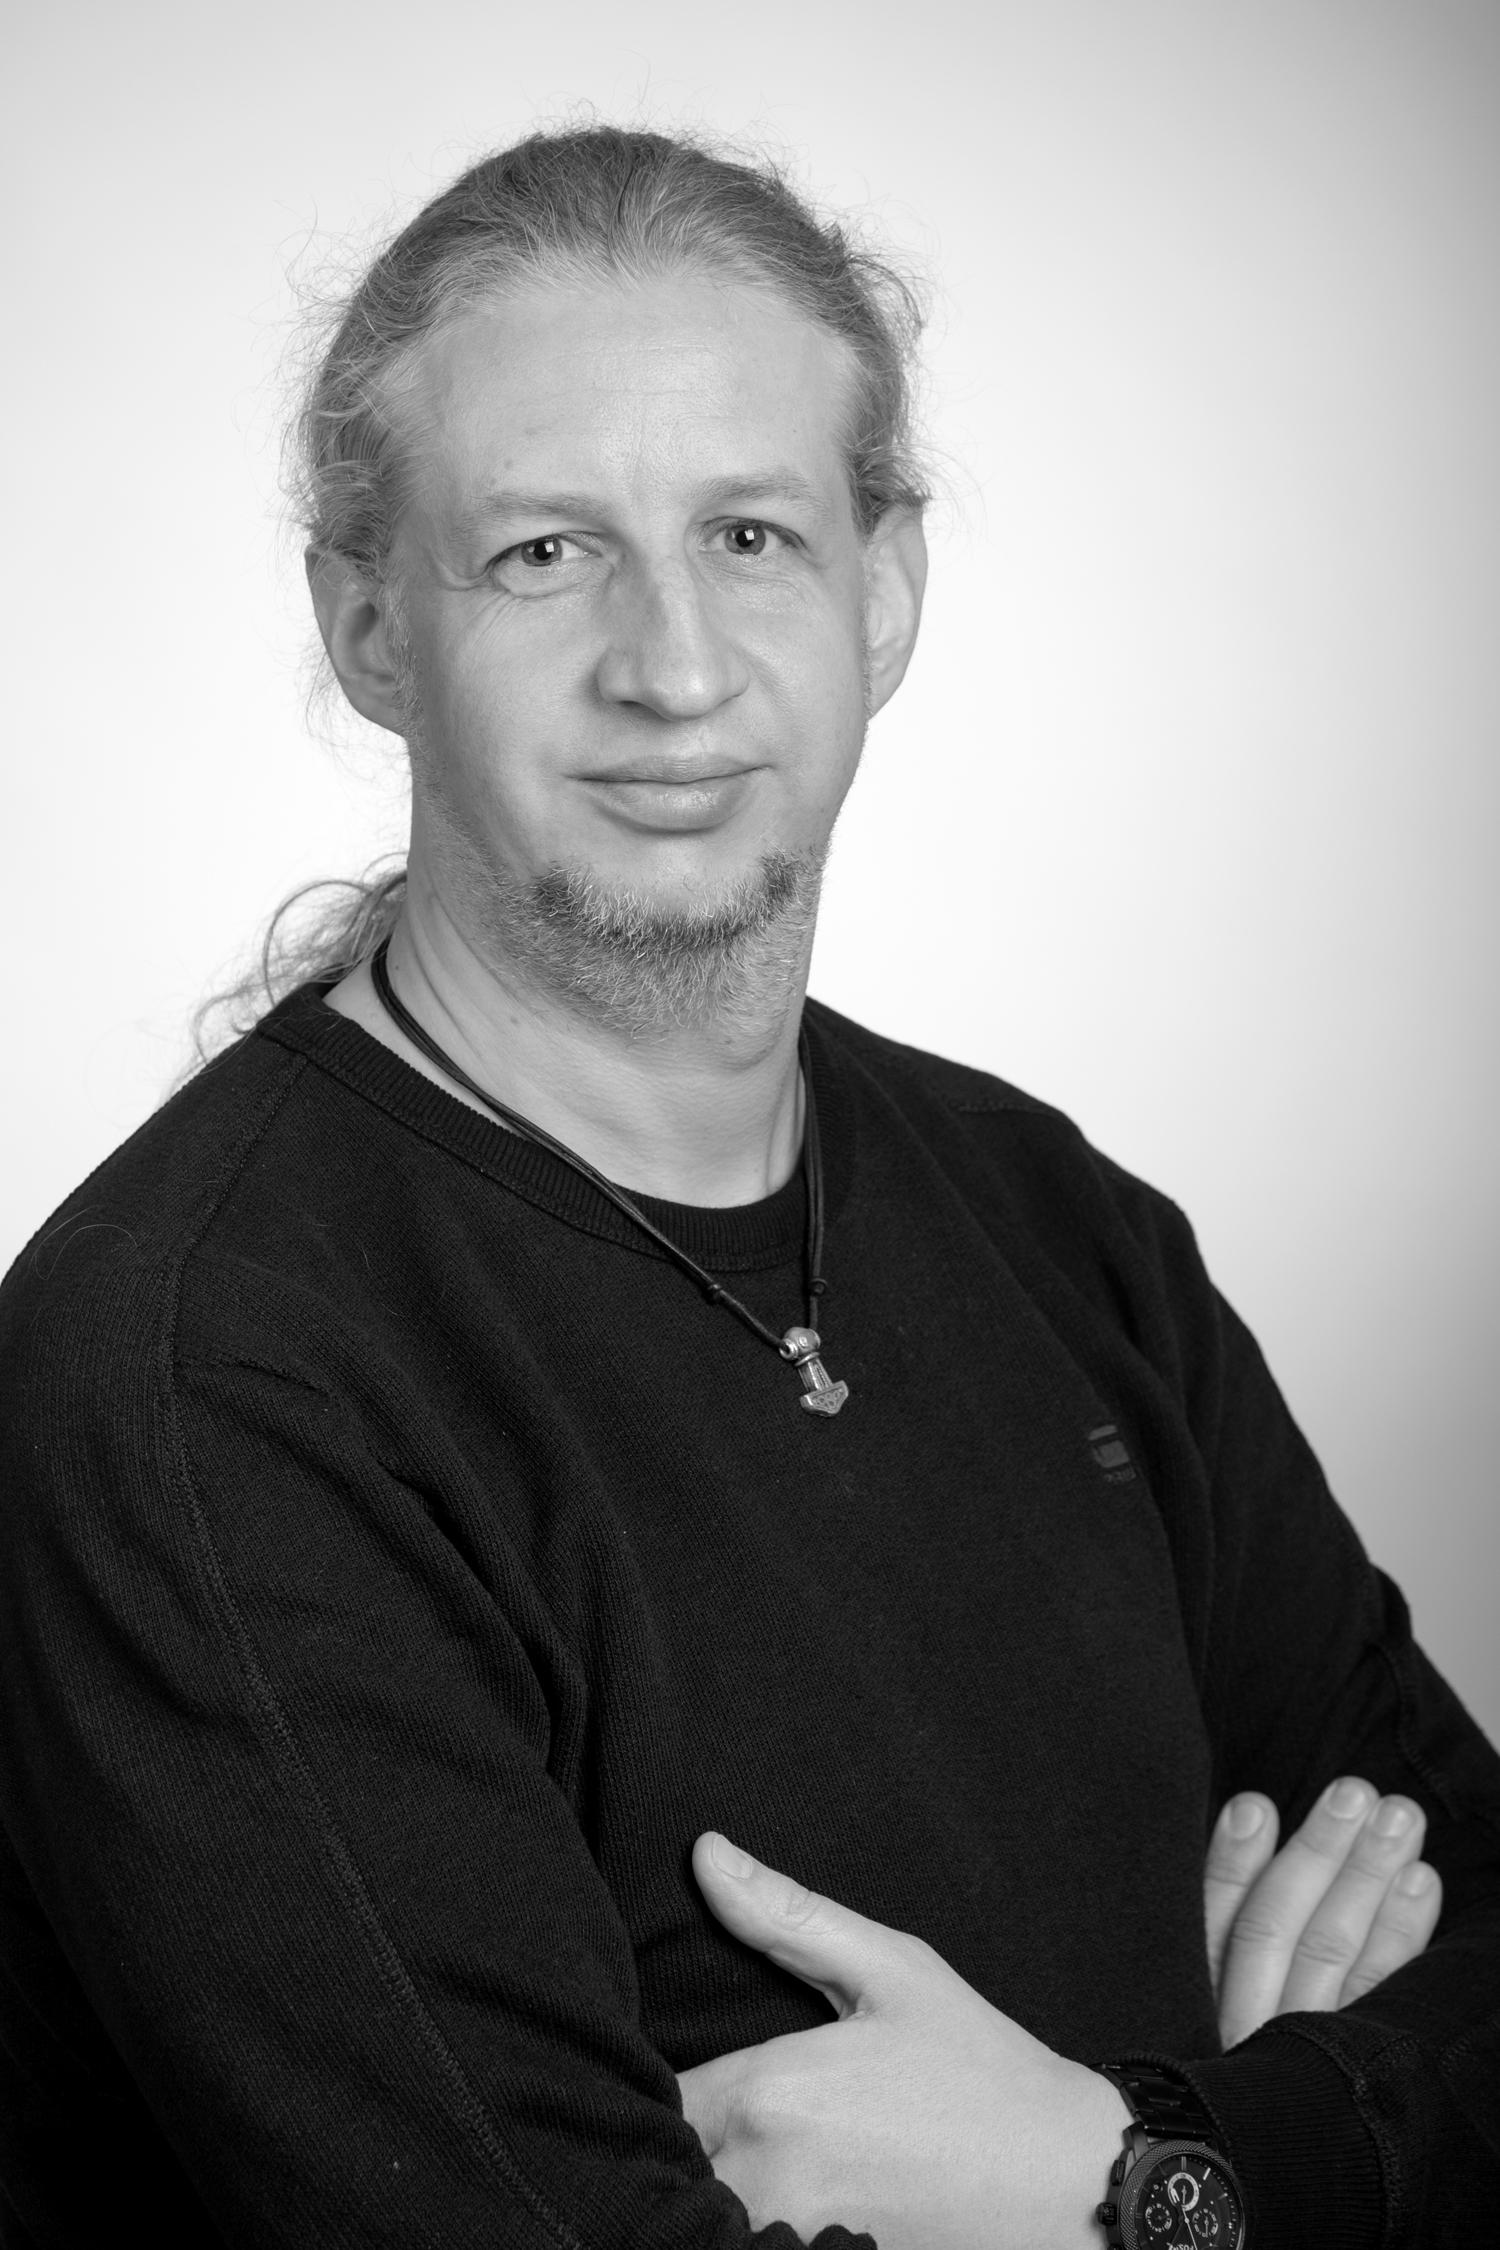 Robert Ferner